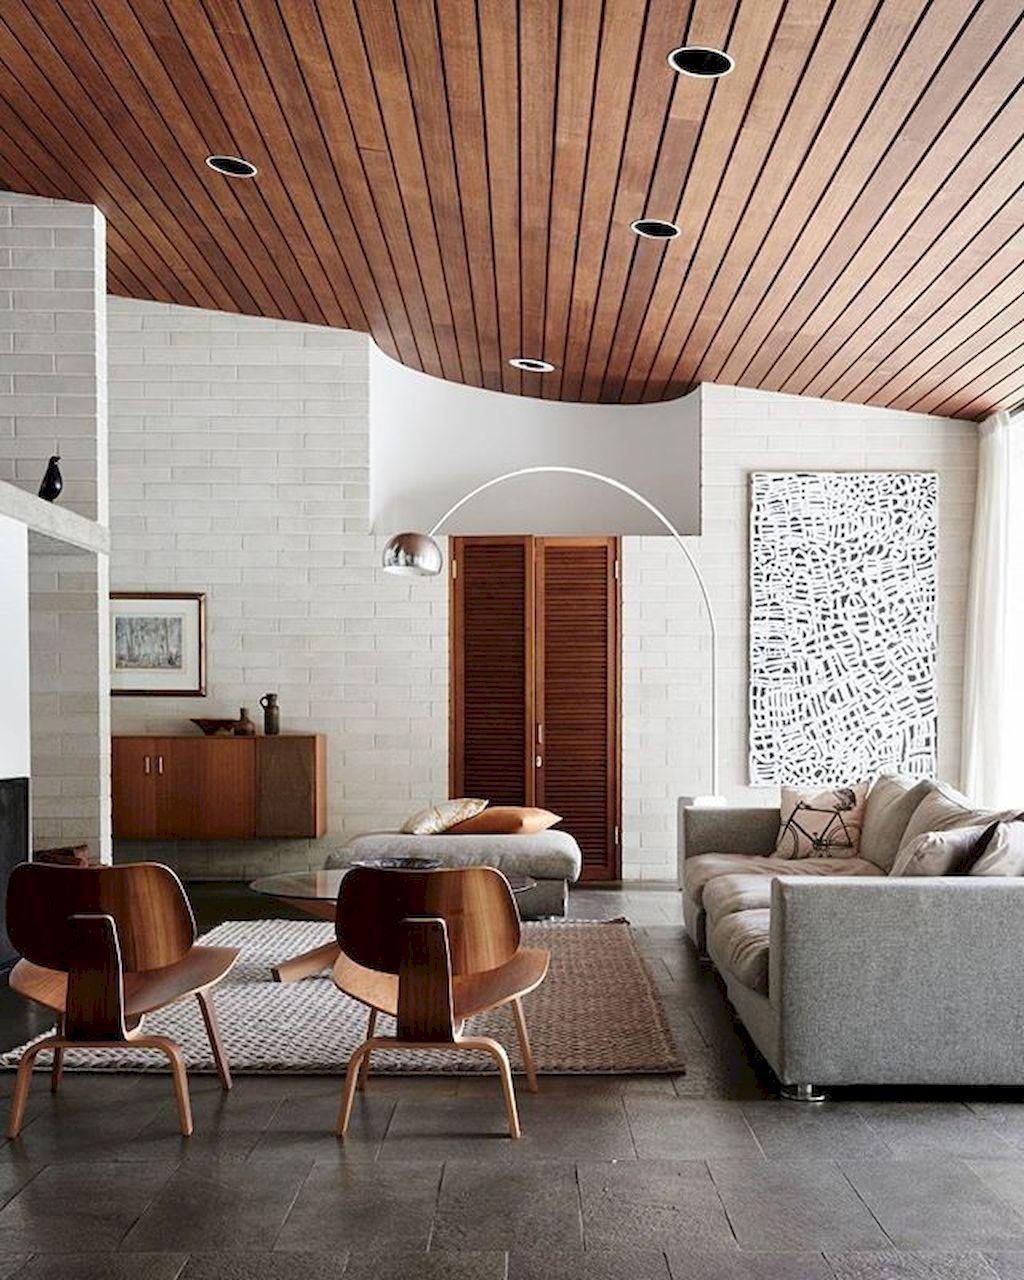 80 Awesome Mid Century Modern Design Ideas | Pinterest | Zuhause ...